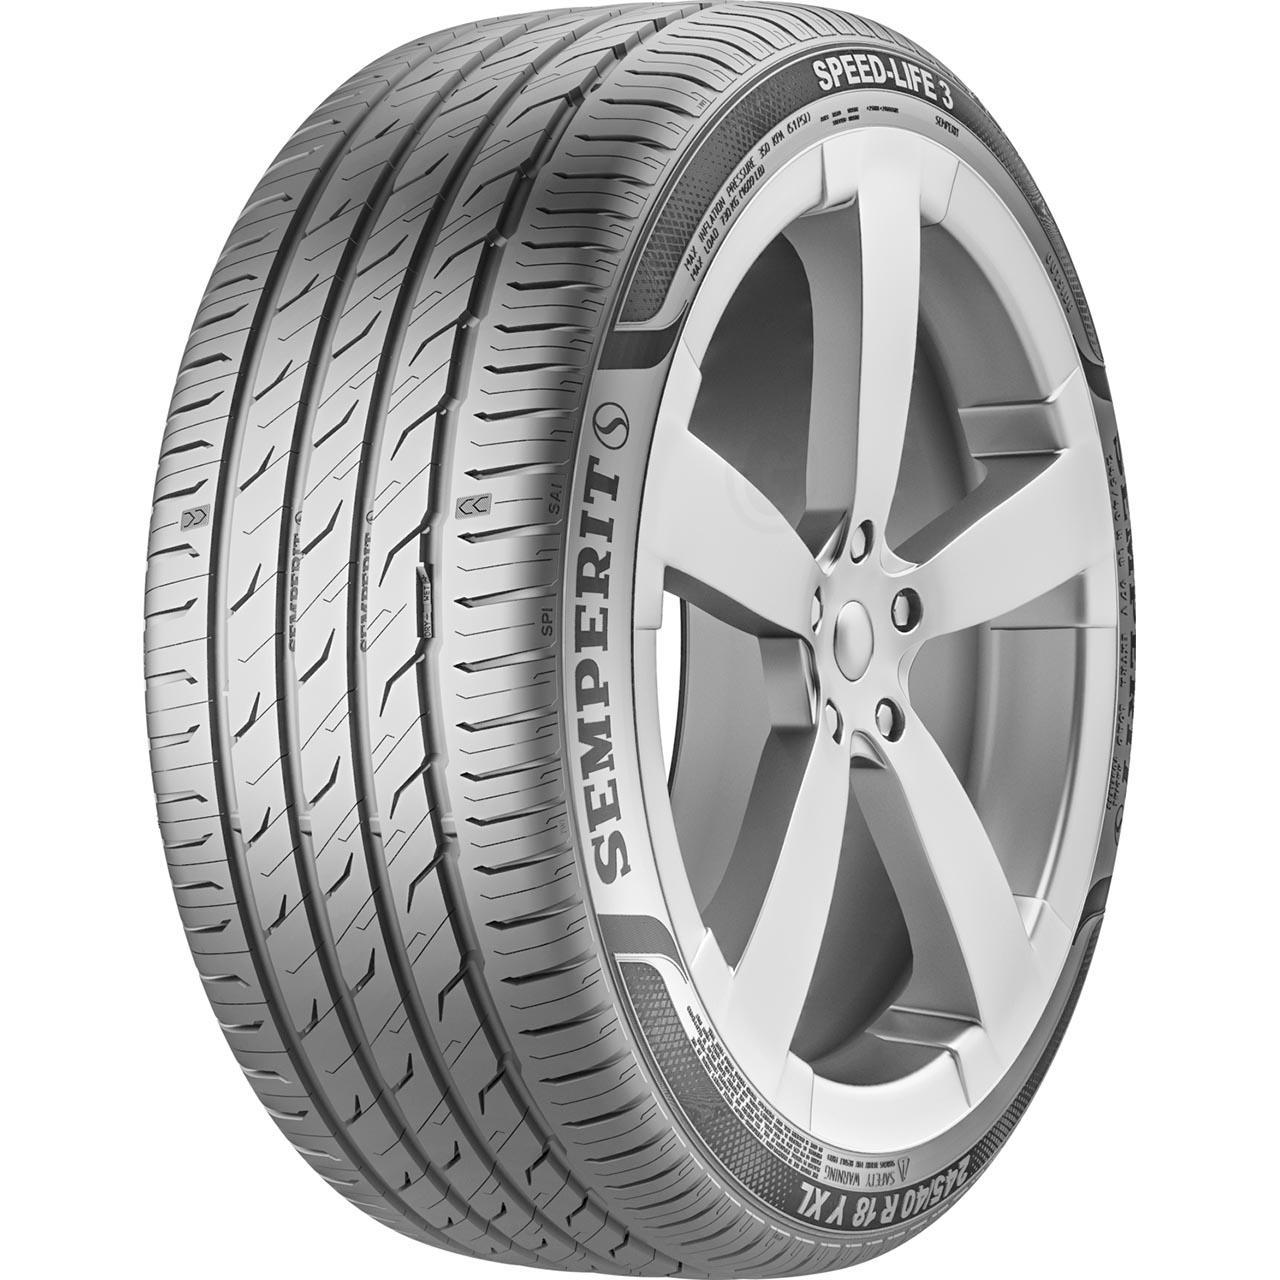 Semperit Speed Life 3 195/55R20 95H XL FR